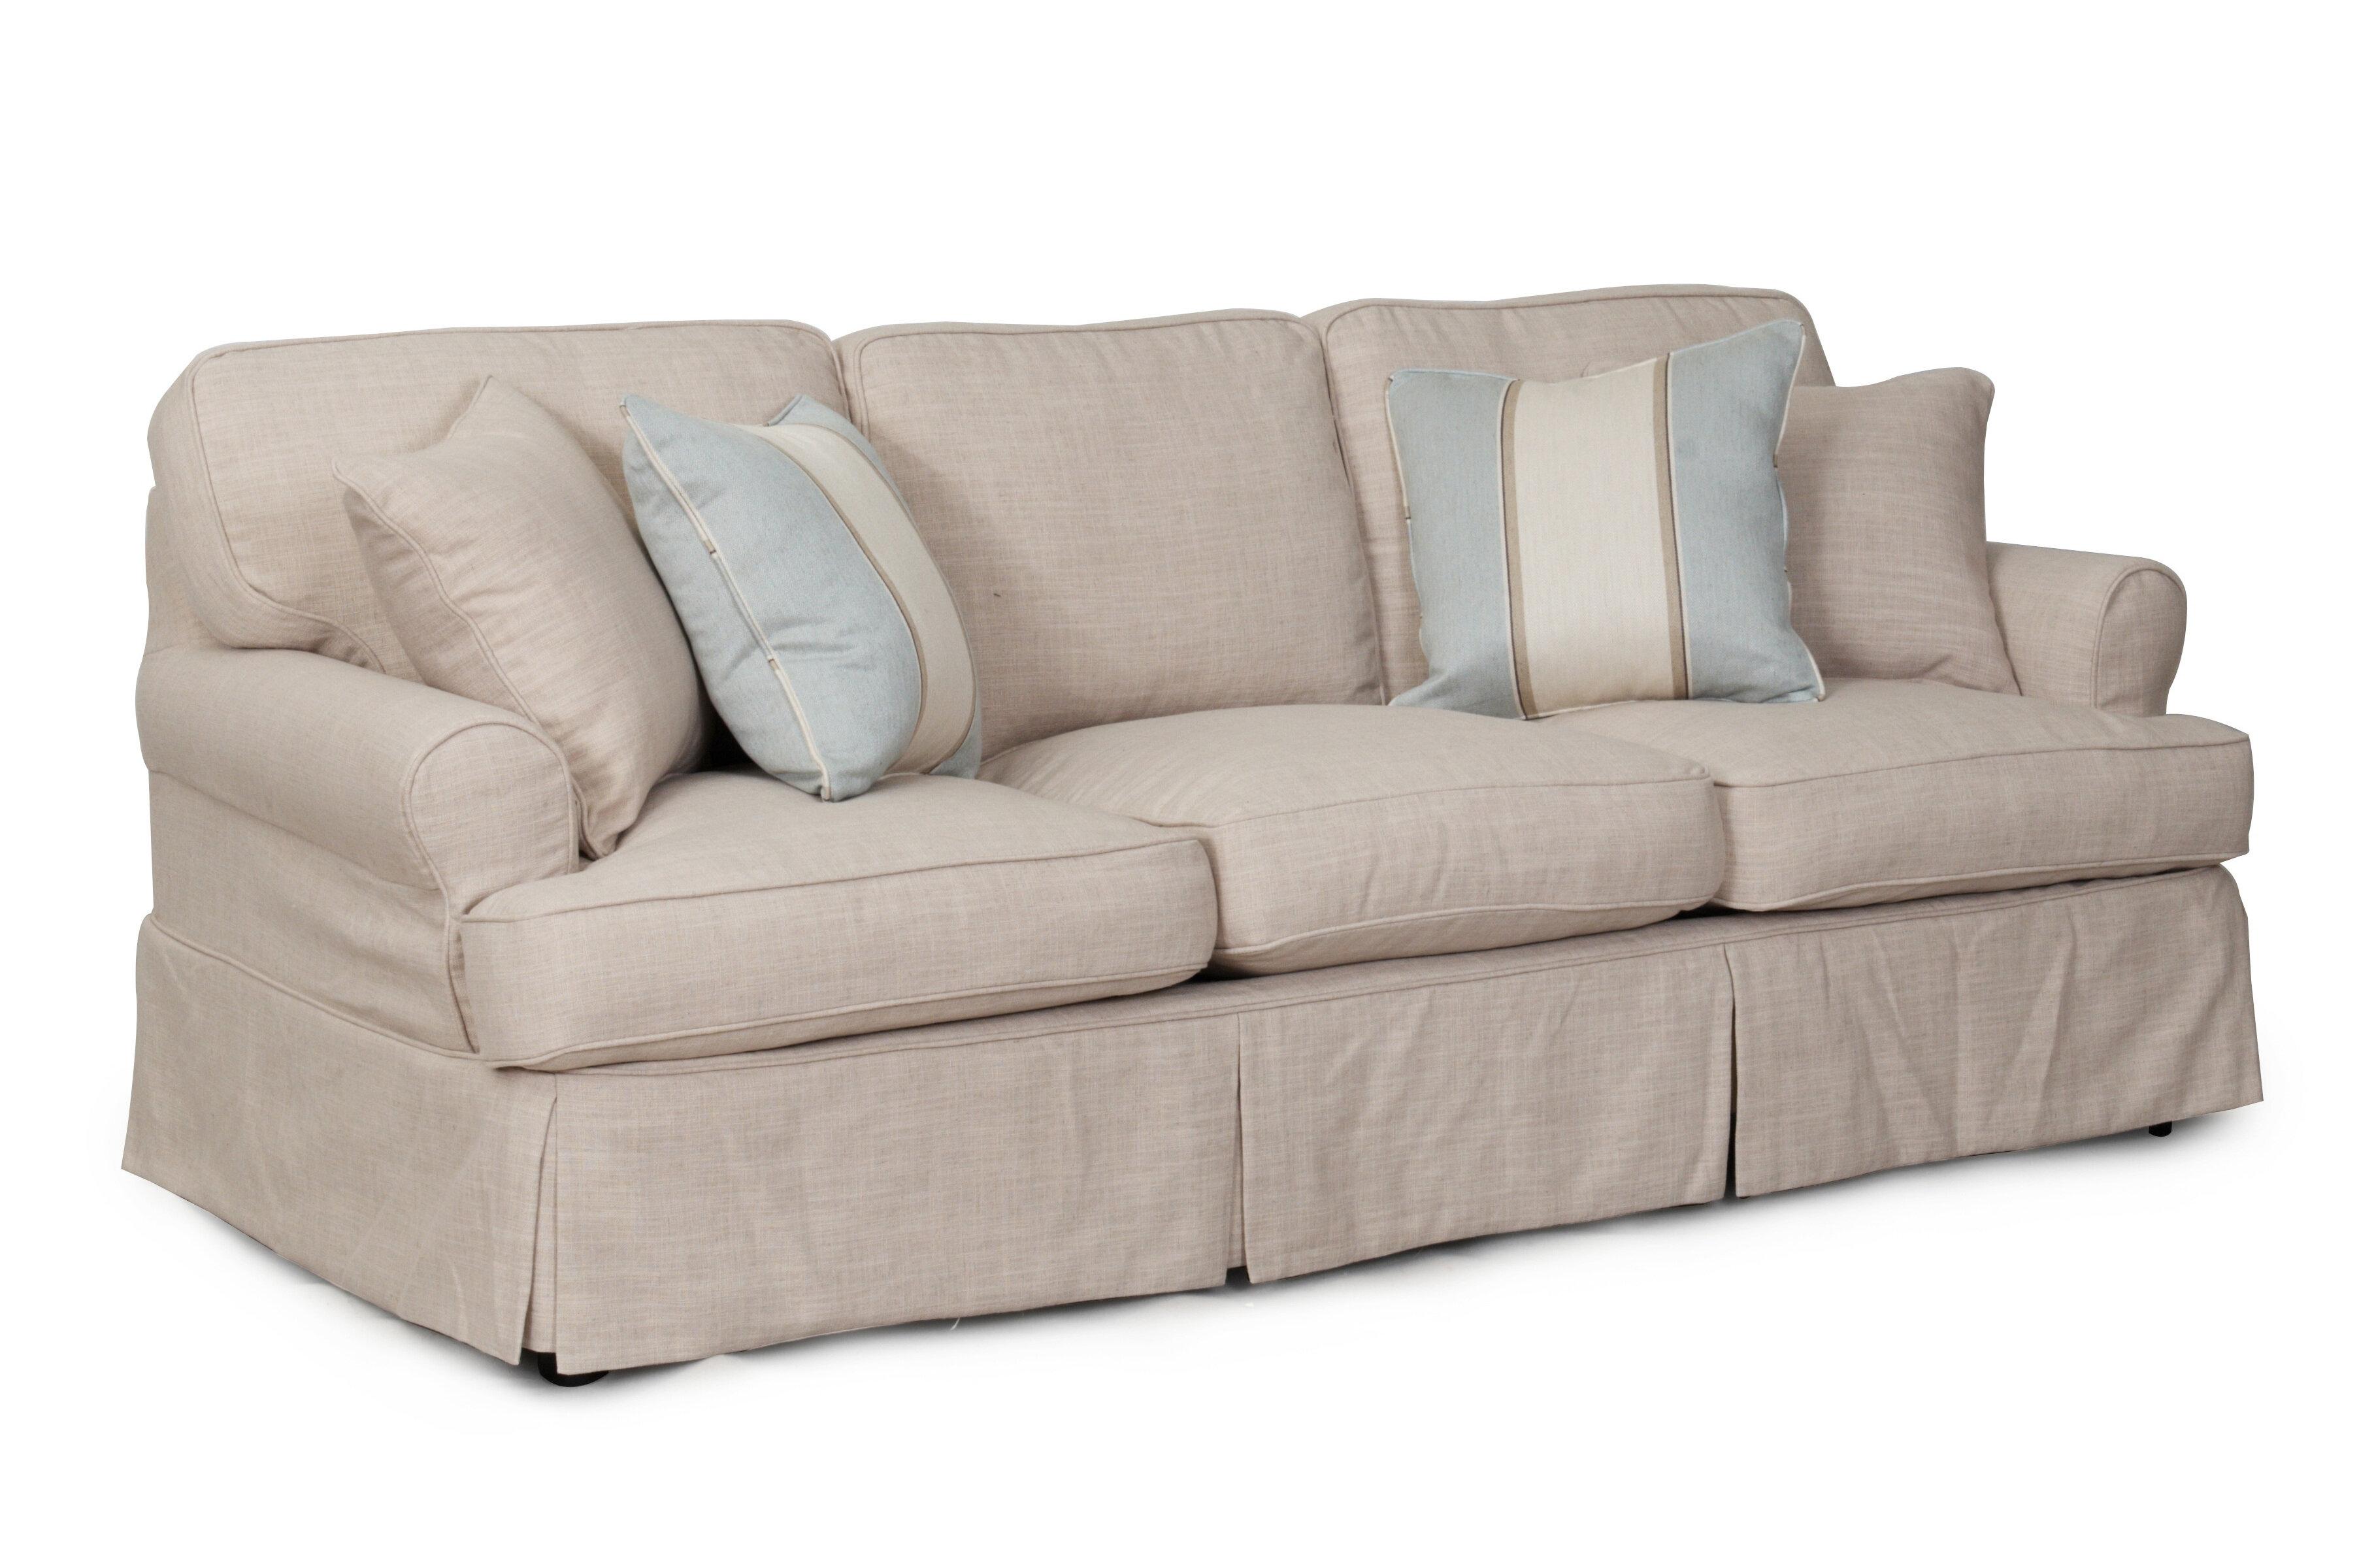 Beachcrest Home Rundle Slipcovered Sofa